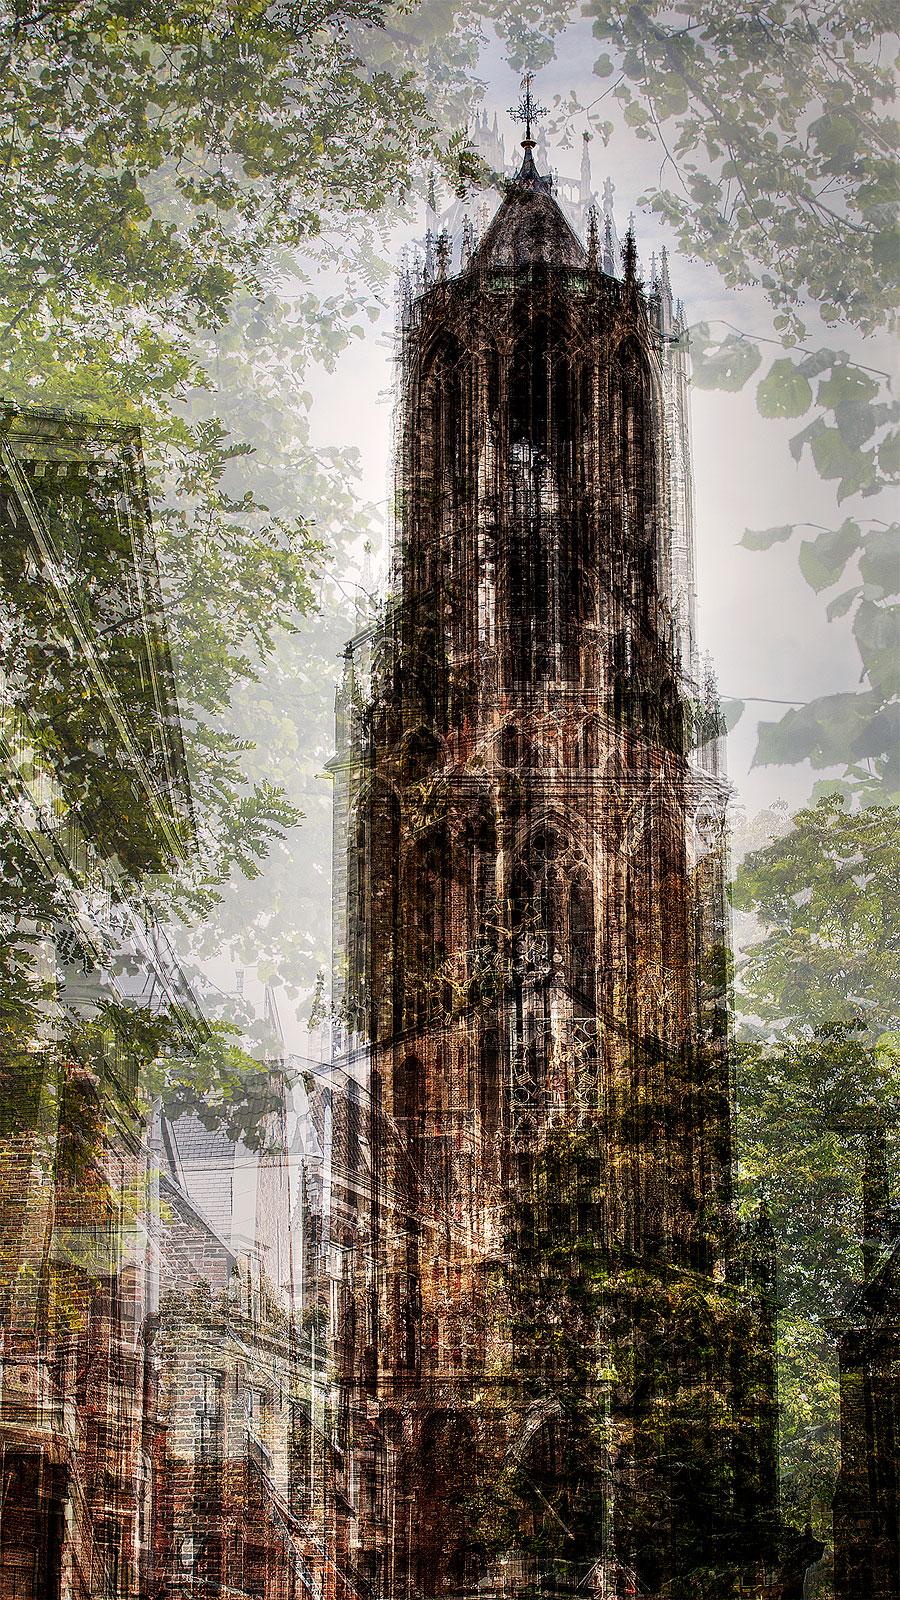 The Dom tower in Utrecht